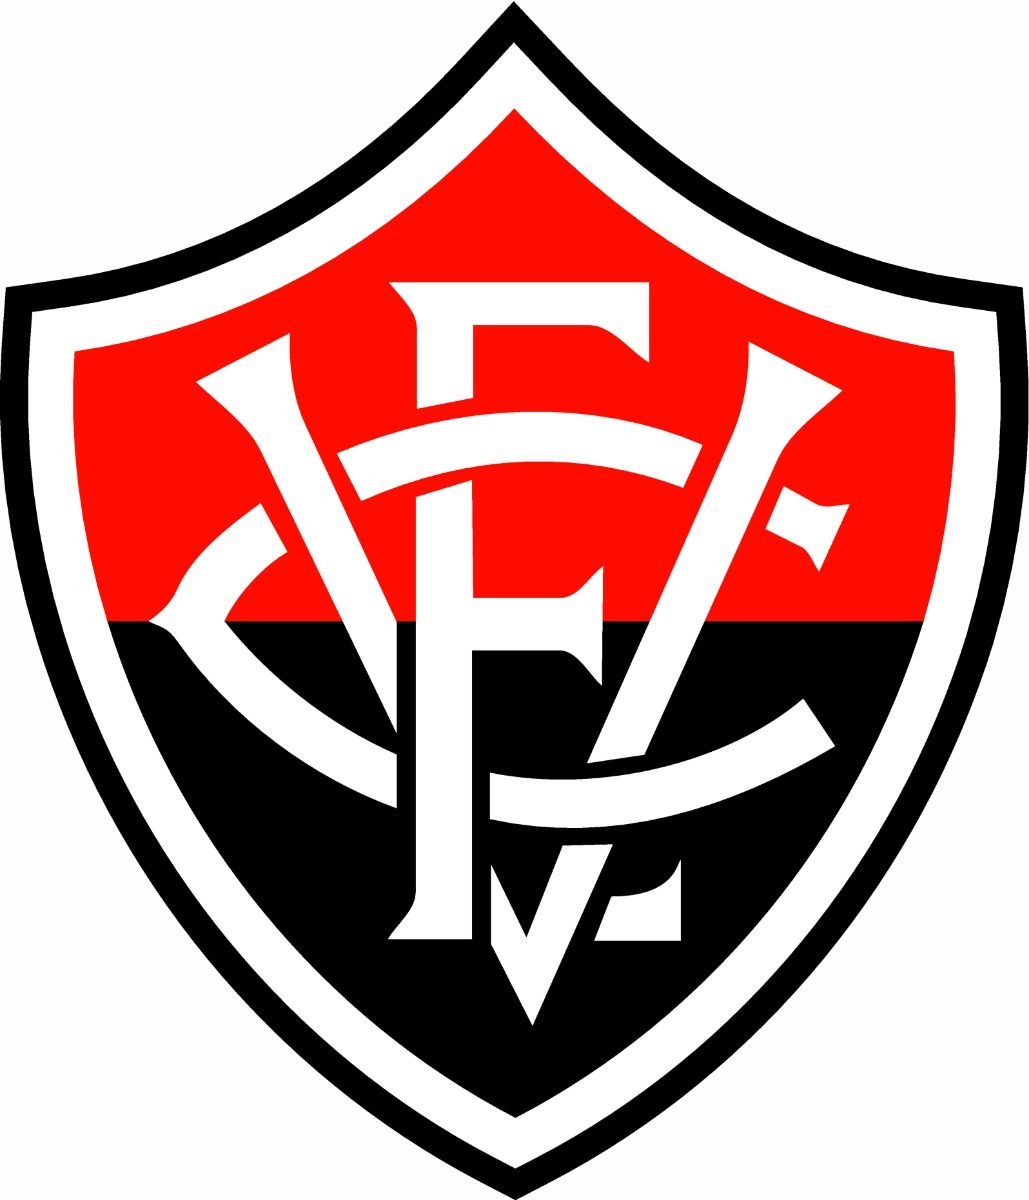 Elipse Mandala Futebol Vitória Brasão 60 Cm Festa Mdf 3mm - R  33 a84b5952914c0